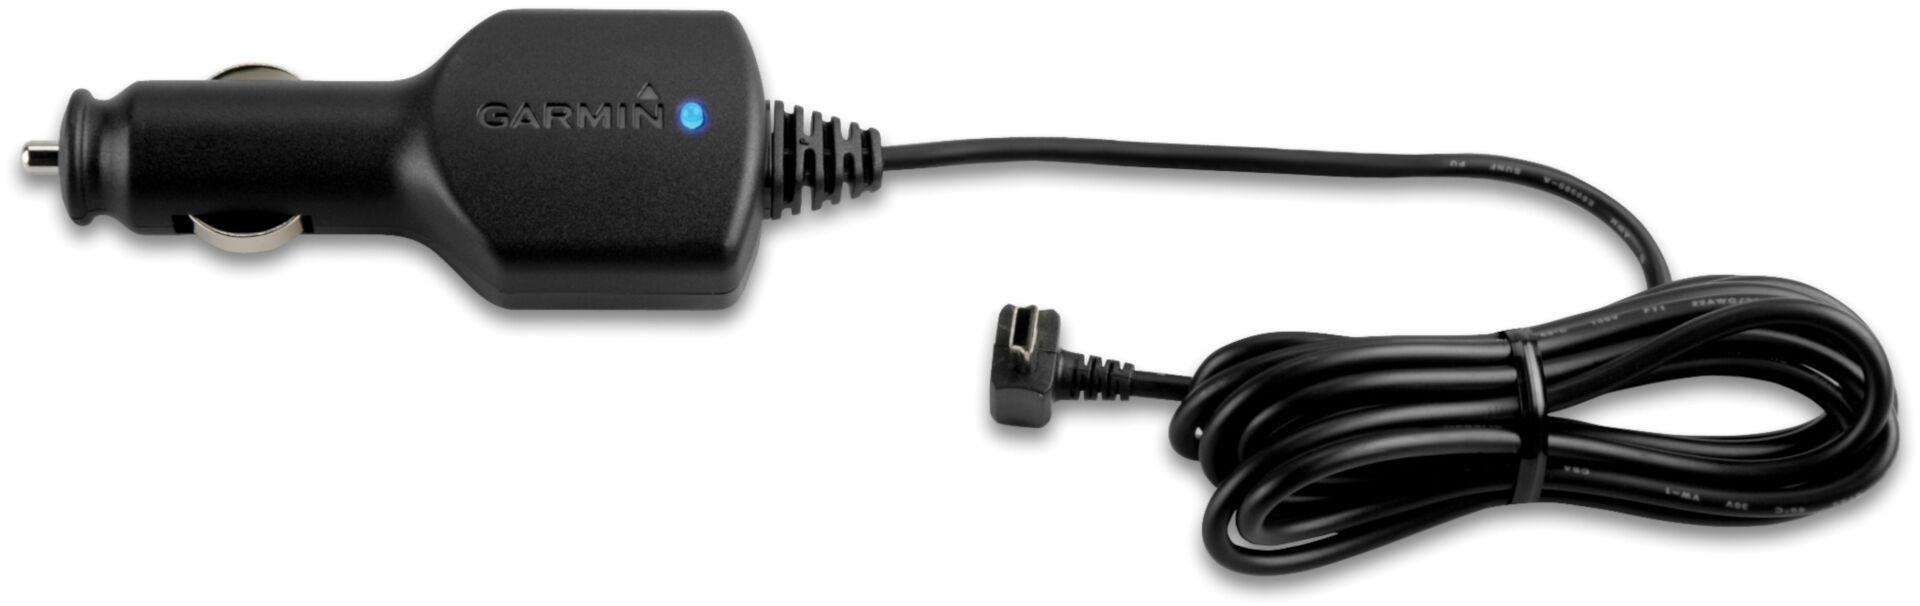 Garmin zumo/Virb Bil strømkabel Svart en størrelse